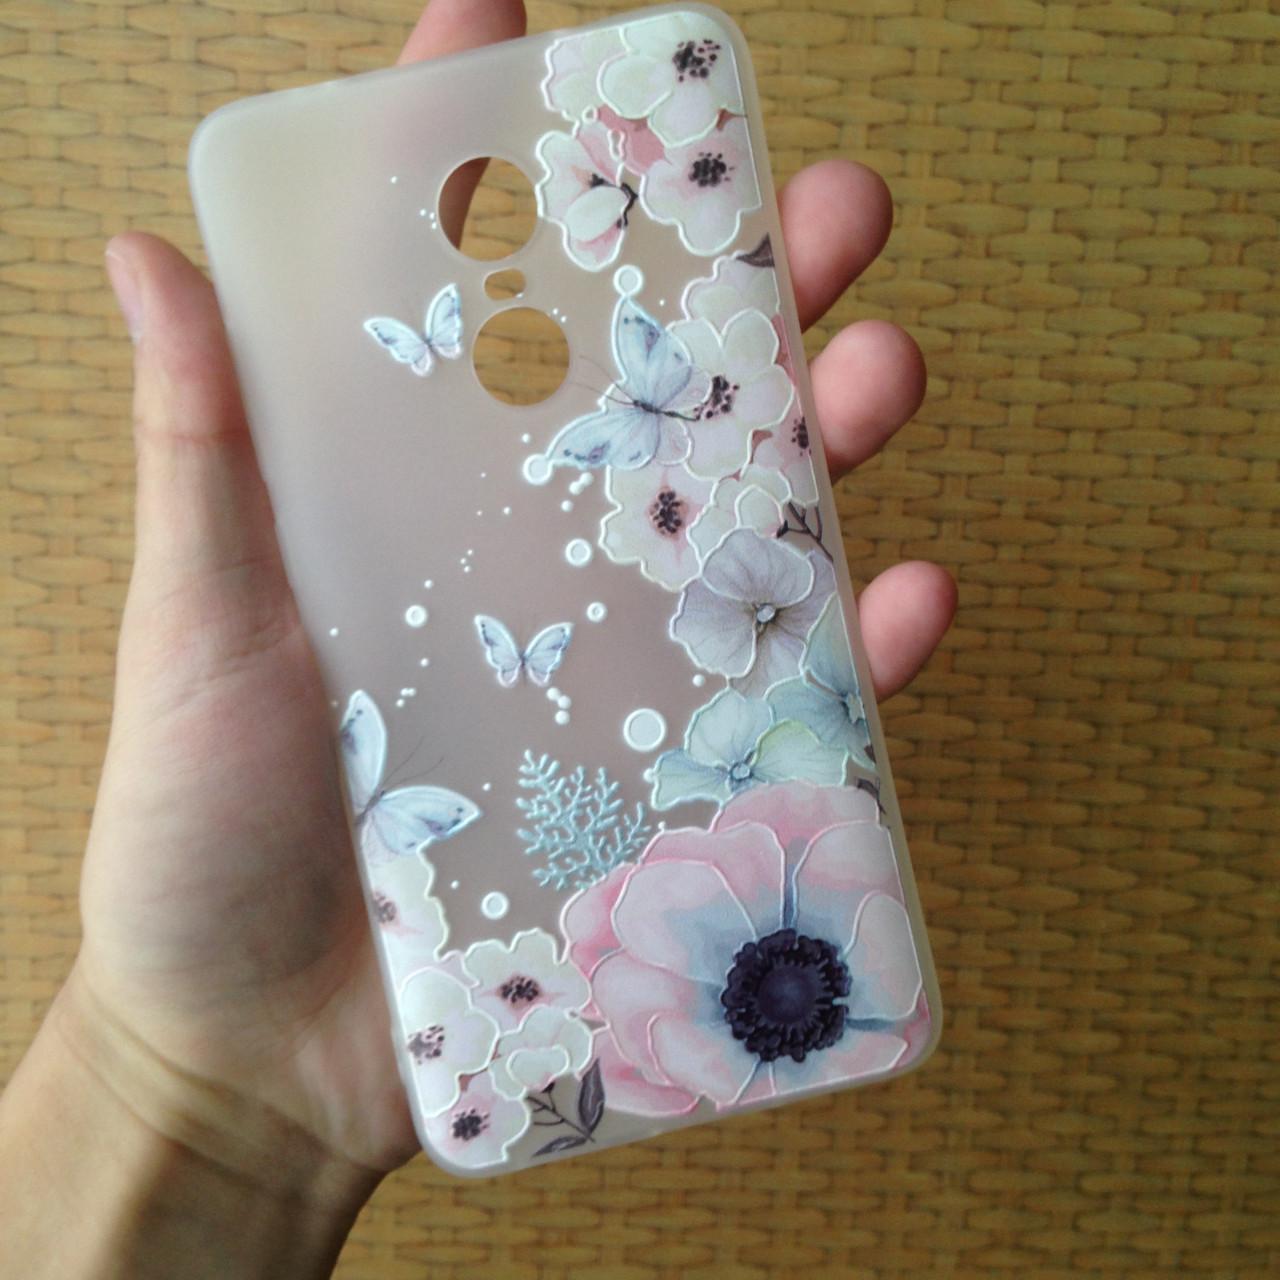 Чехол для Xiaomi Redmi Note 4X, бампер, накладка, чохол, силиконовый, силіконовий